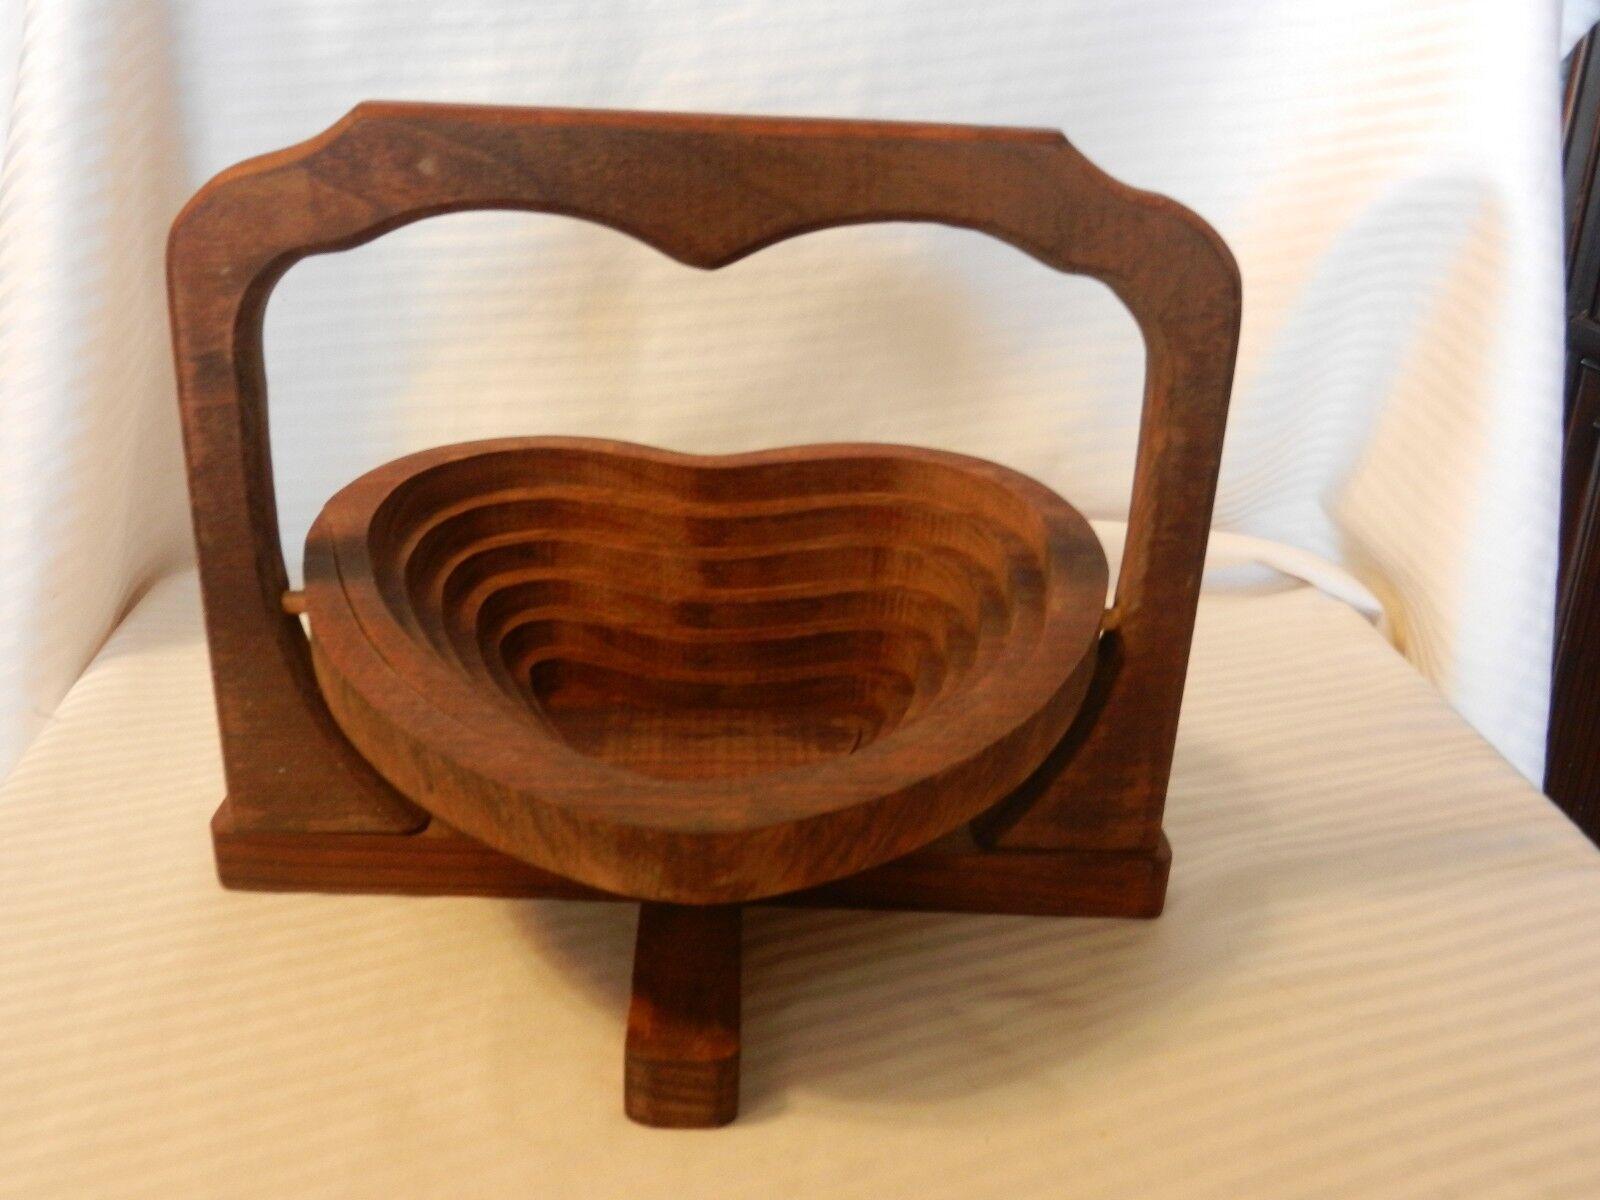 Vintage Hand Made Arts & Crafts Wood Folding Heart Shaped Basket Dish